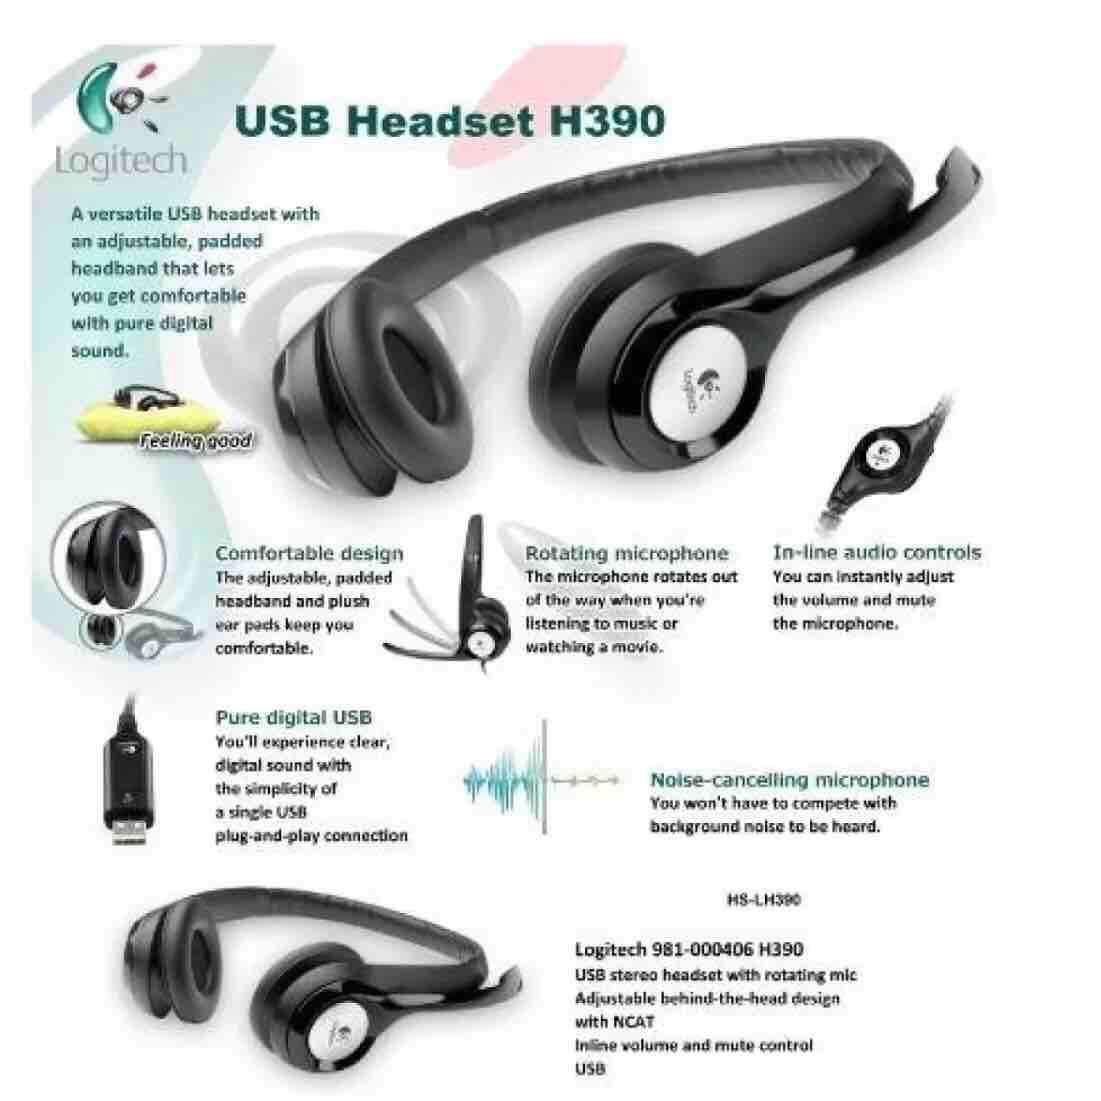 Noise Cancelling Microphone Headphones Logitech Comfort//USB Headset H390